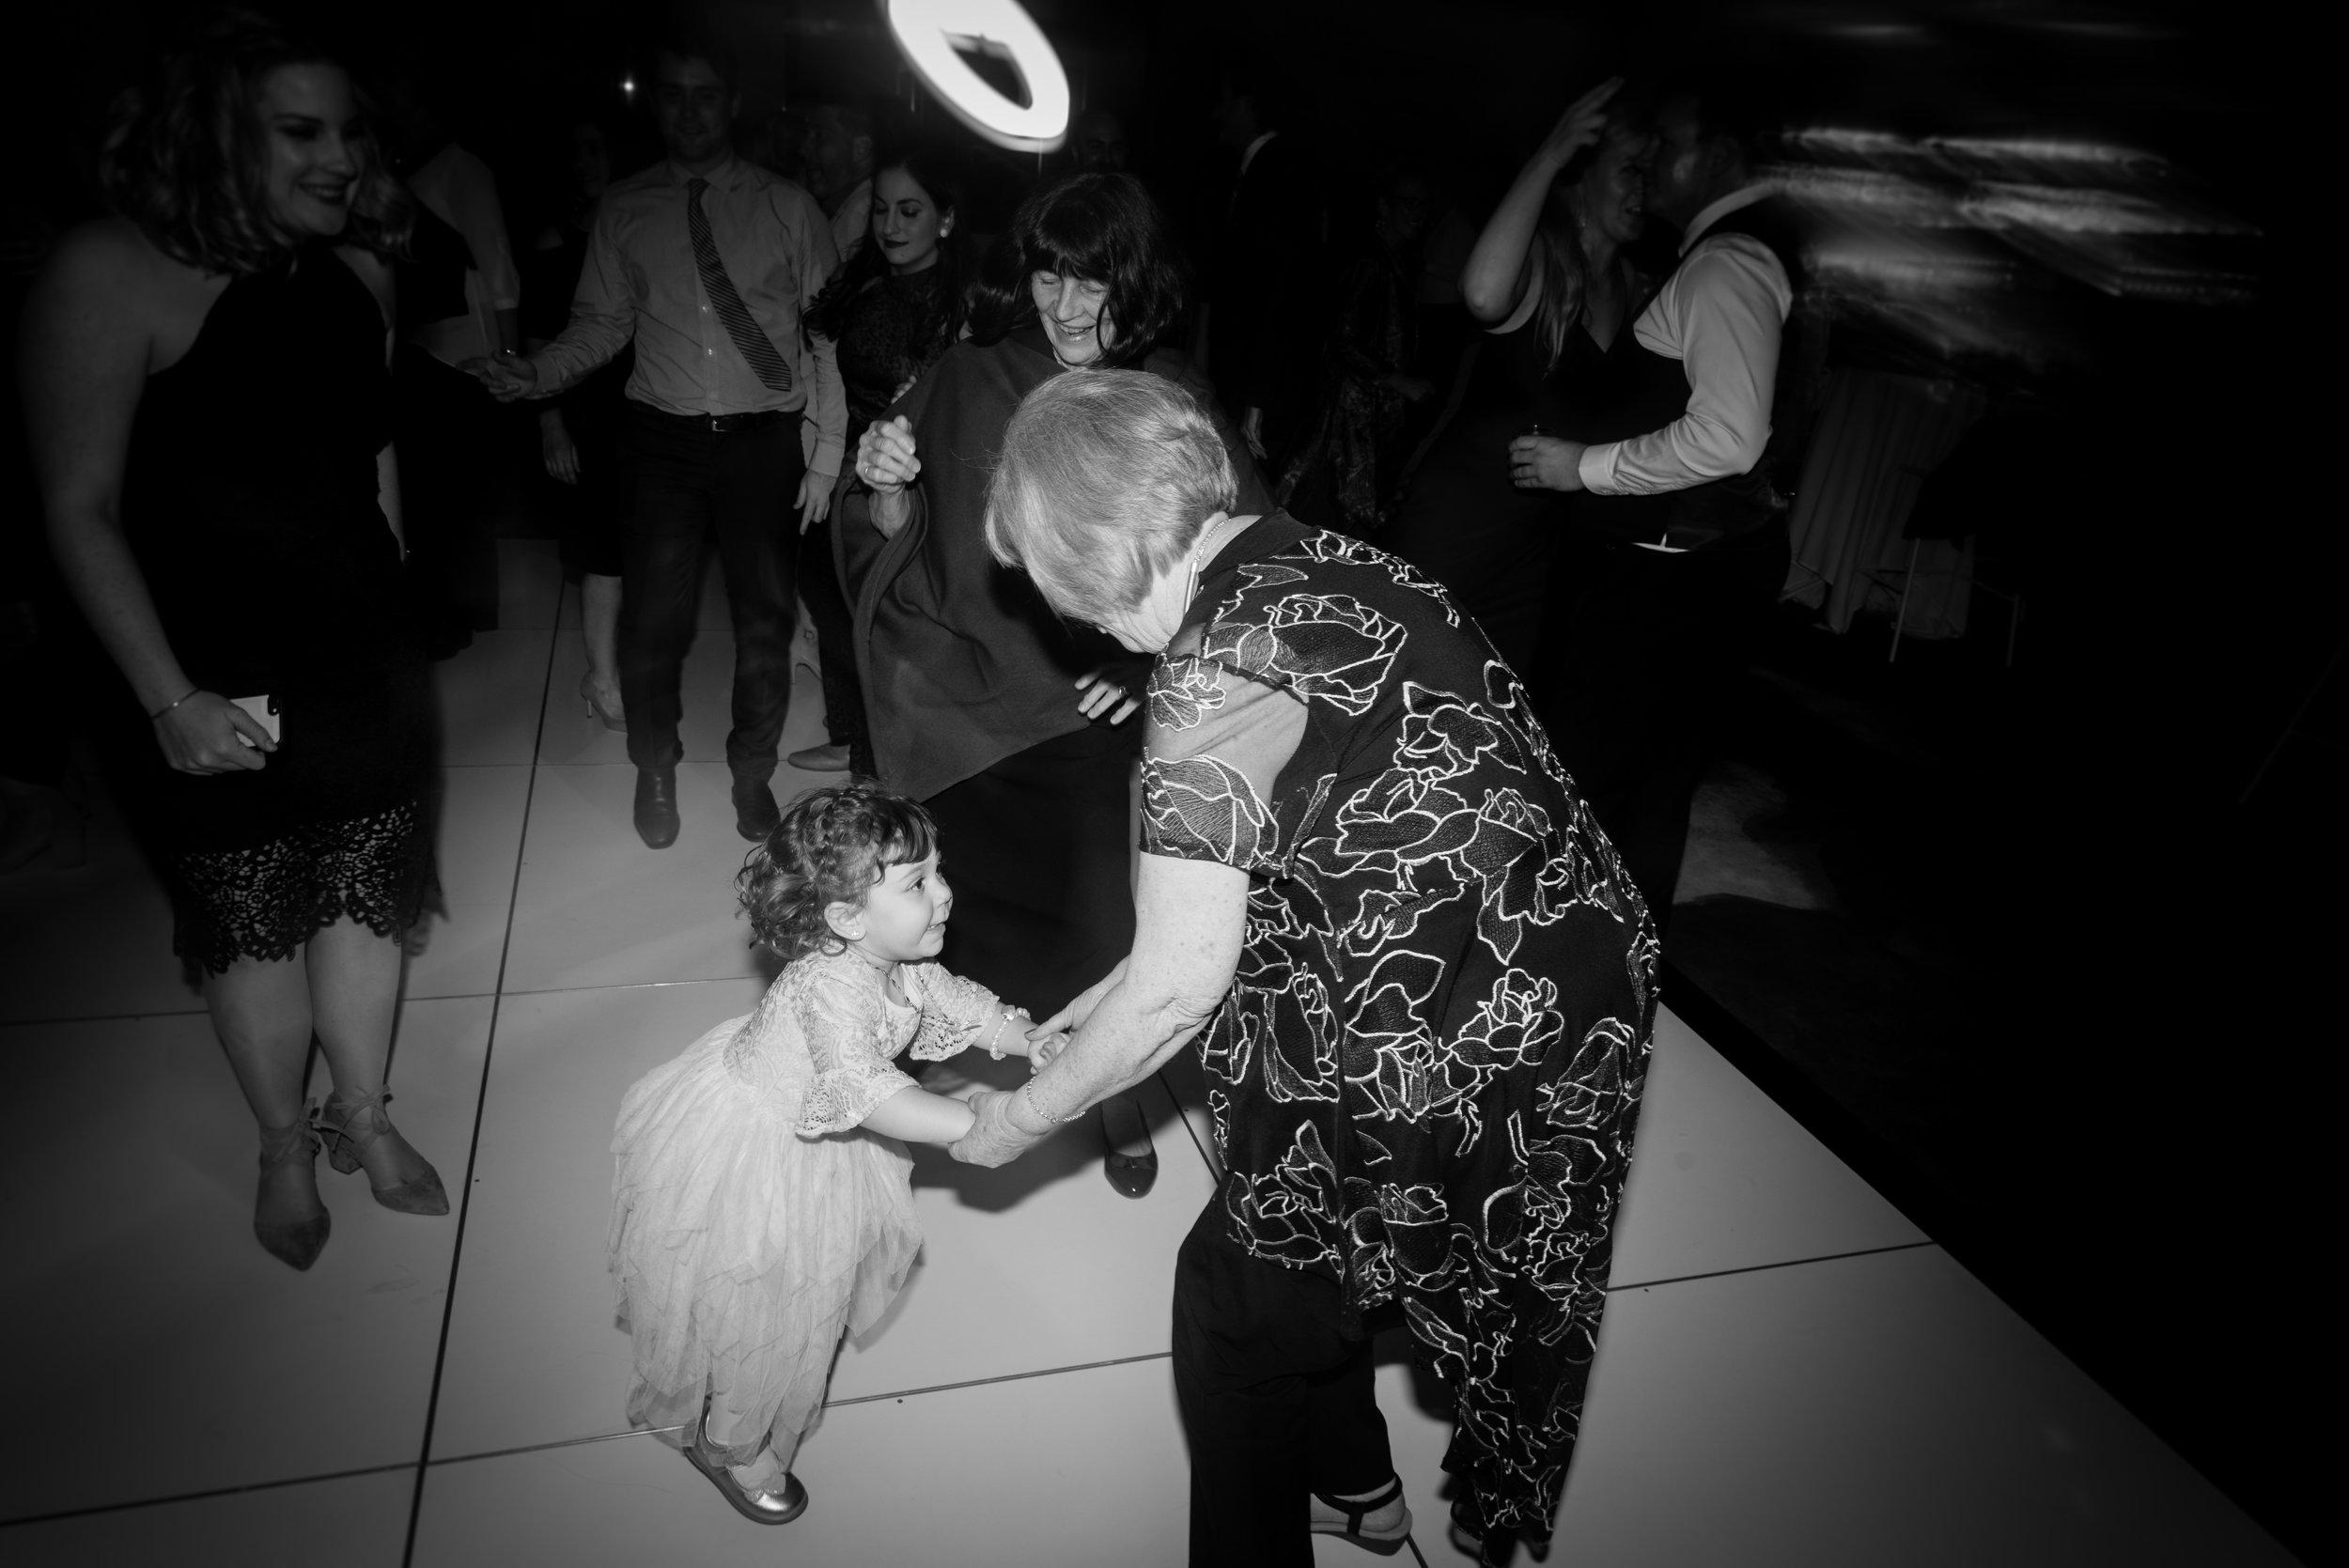 brisbane-city-wedding-photographer-romantic-wedding-131.jpg